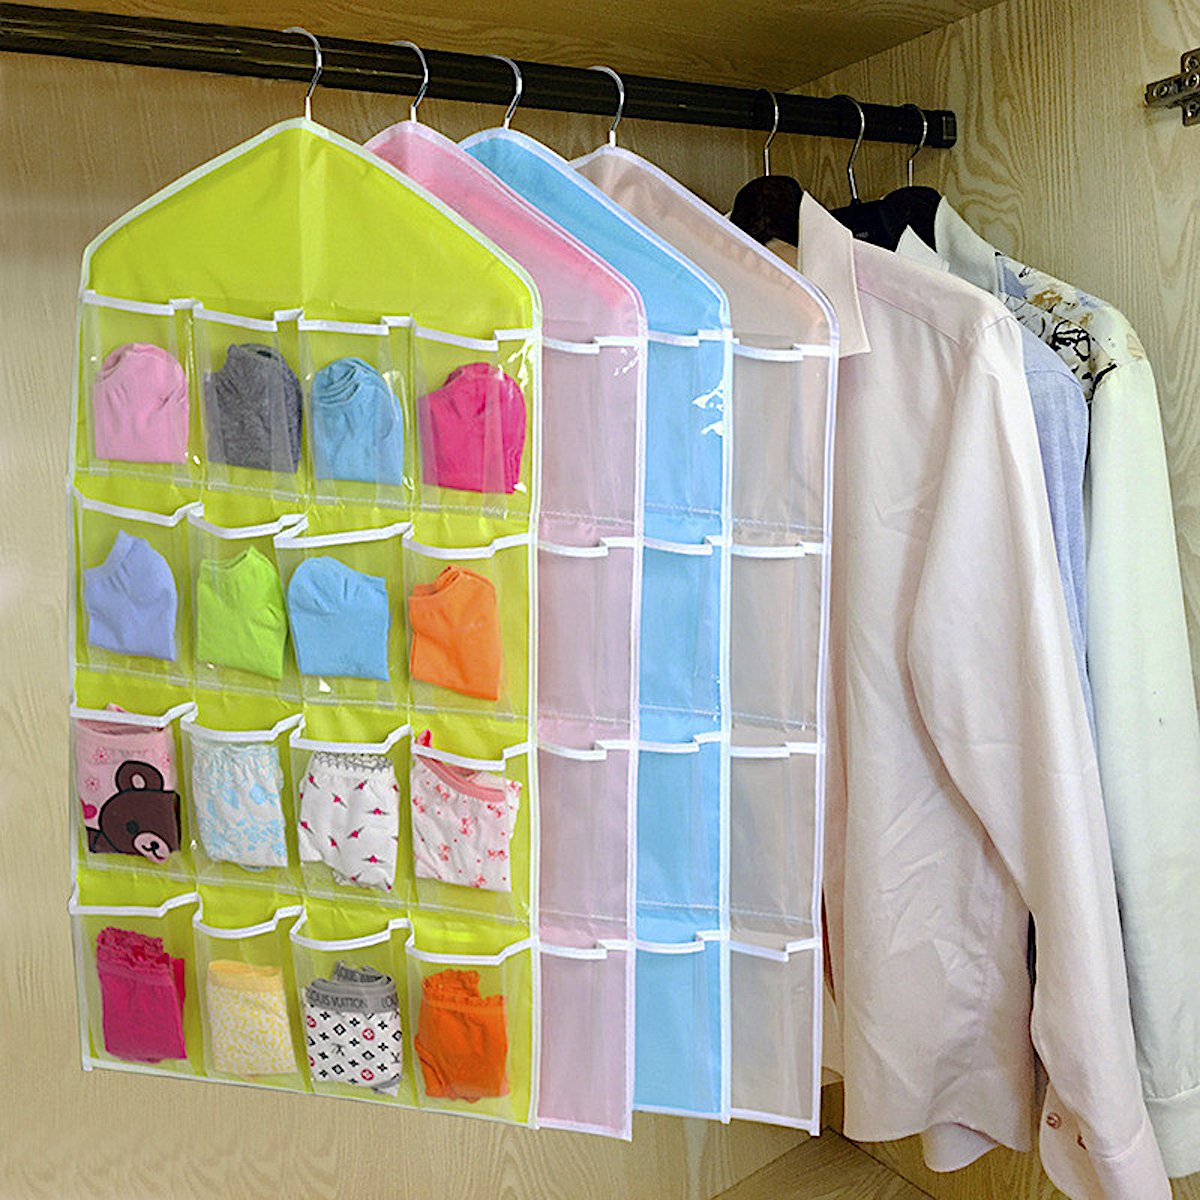 funda bolsa para colgar con 16/compartimentos cosm/ético etc ligera ropa interior fina para guardar joyas juguetes ropa de manualidades organizador calcetines Bolsa de almacenamiento